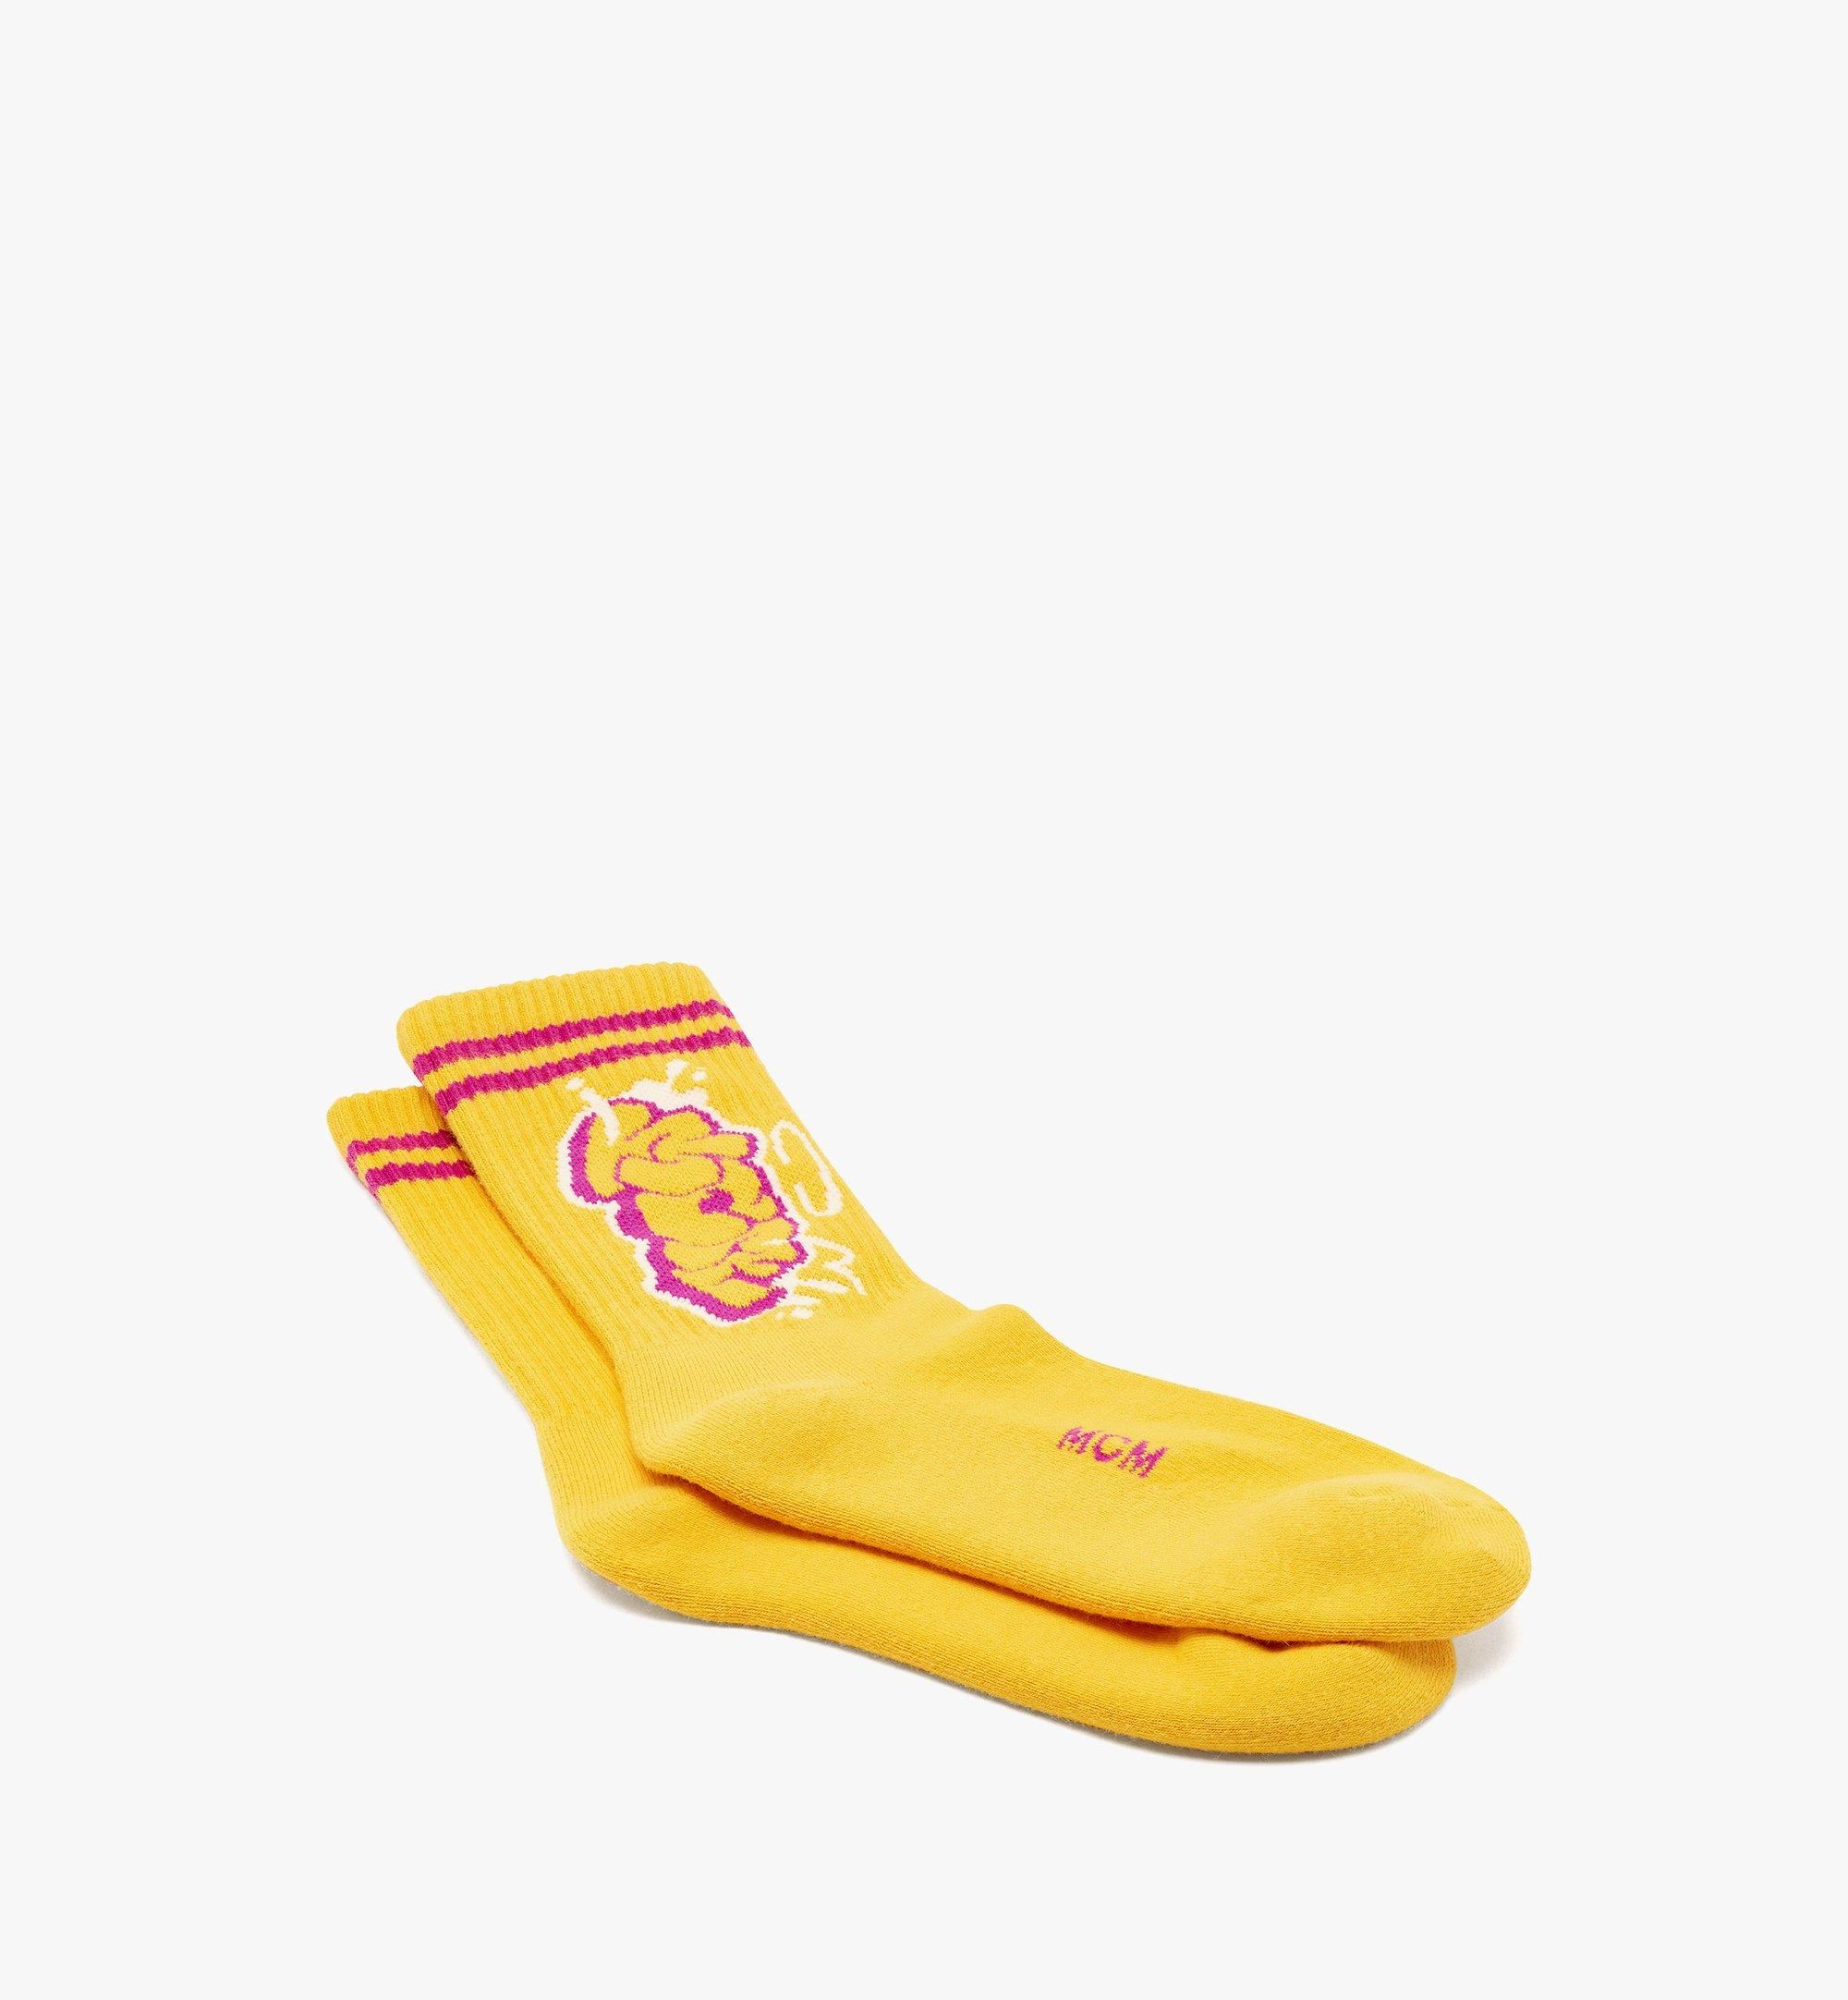 MCM MCM x SAMBYPEN 針織標誌襪子 Yellow MEZBASP01YW0ML 更多視圖 1